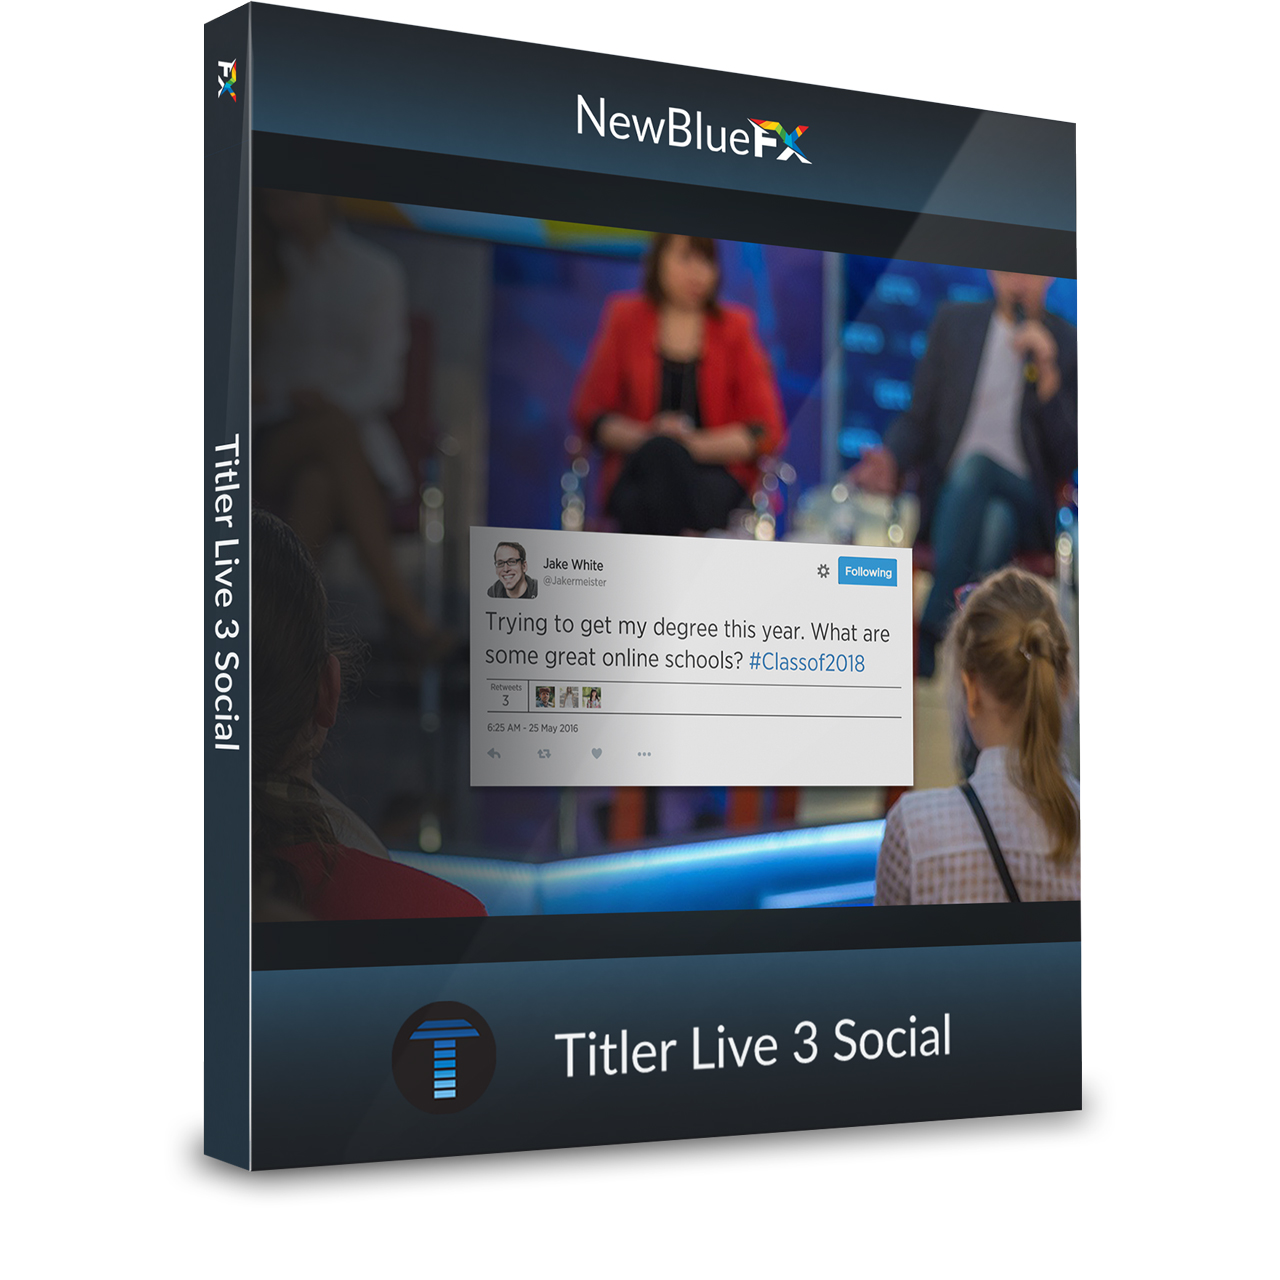 titler live 3 social